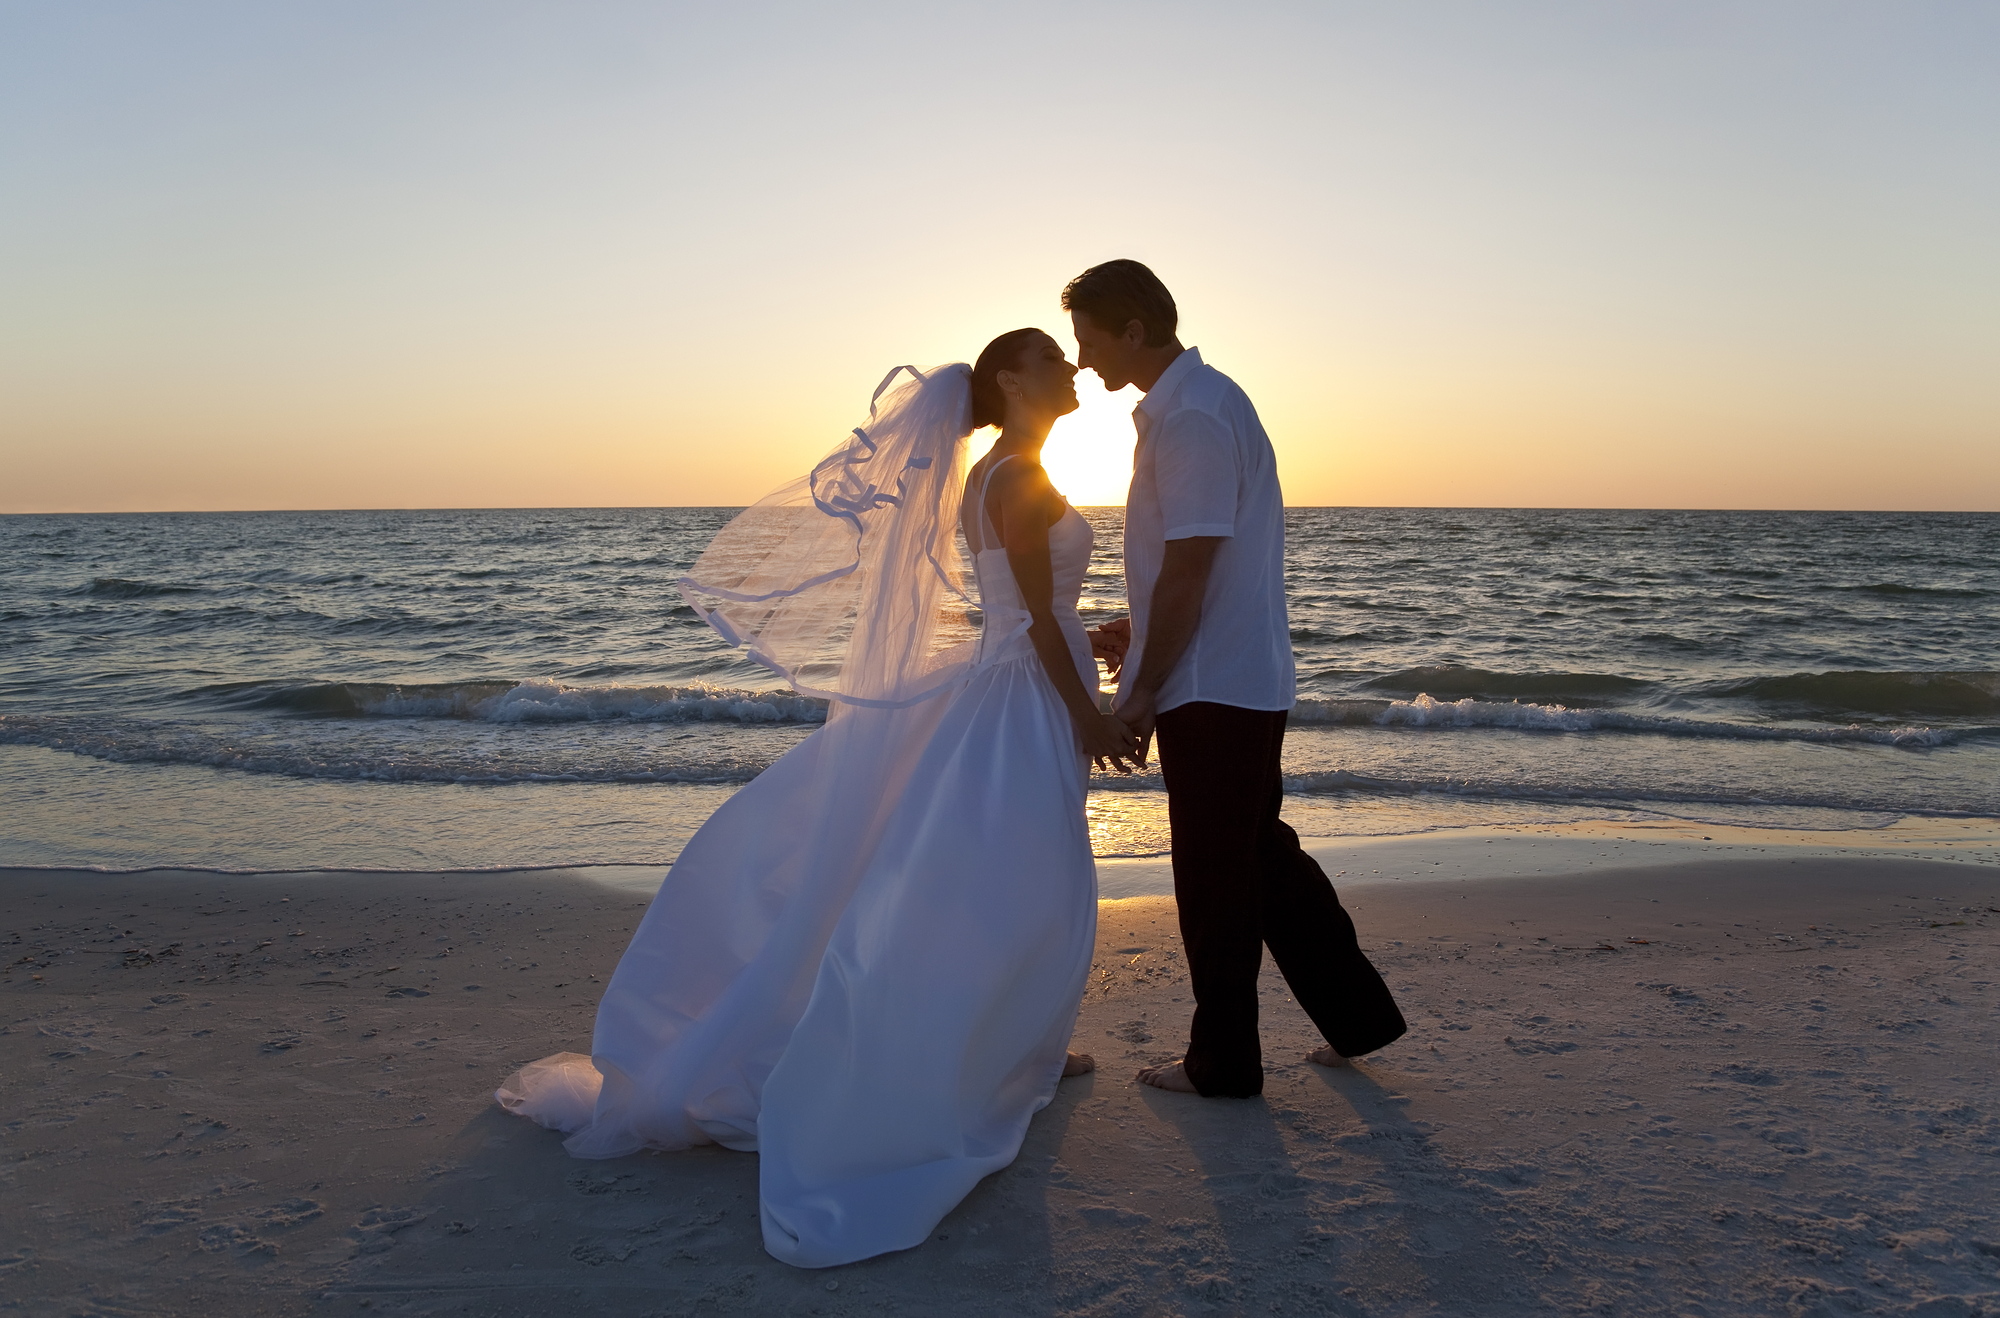 Beach Wedding Bliss: Best Plus-Size Wedding Dress Styles for a Seaside Ceremony